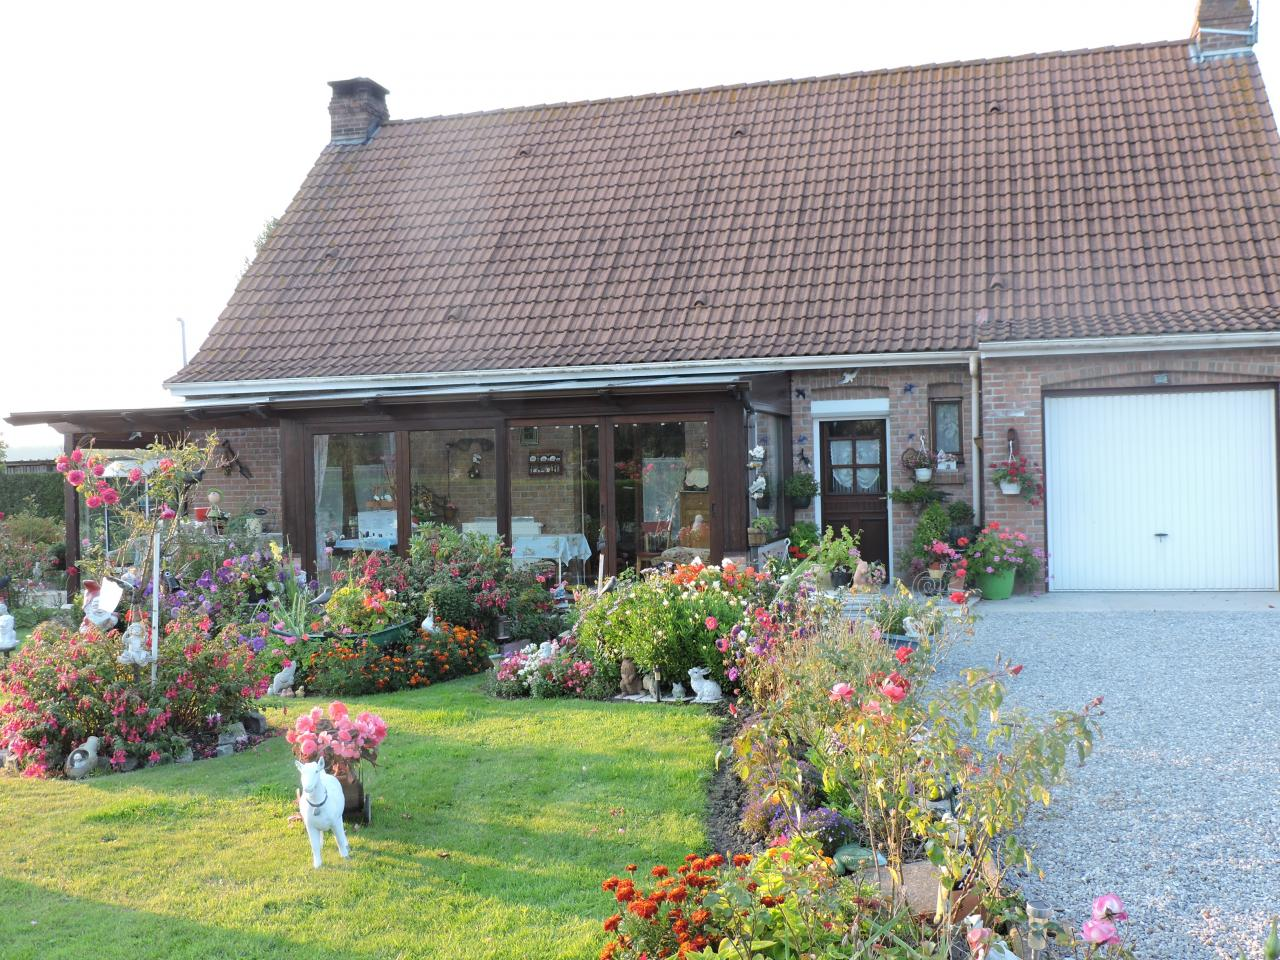 Maisons fleuries 2014 (35)